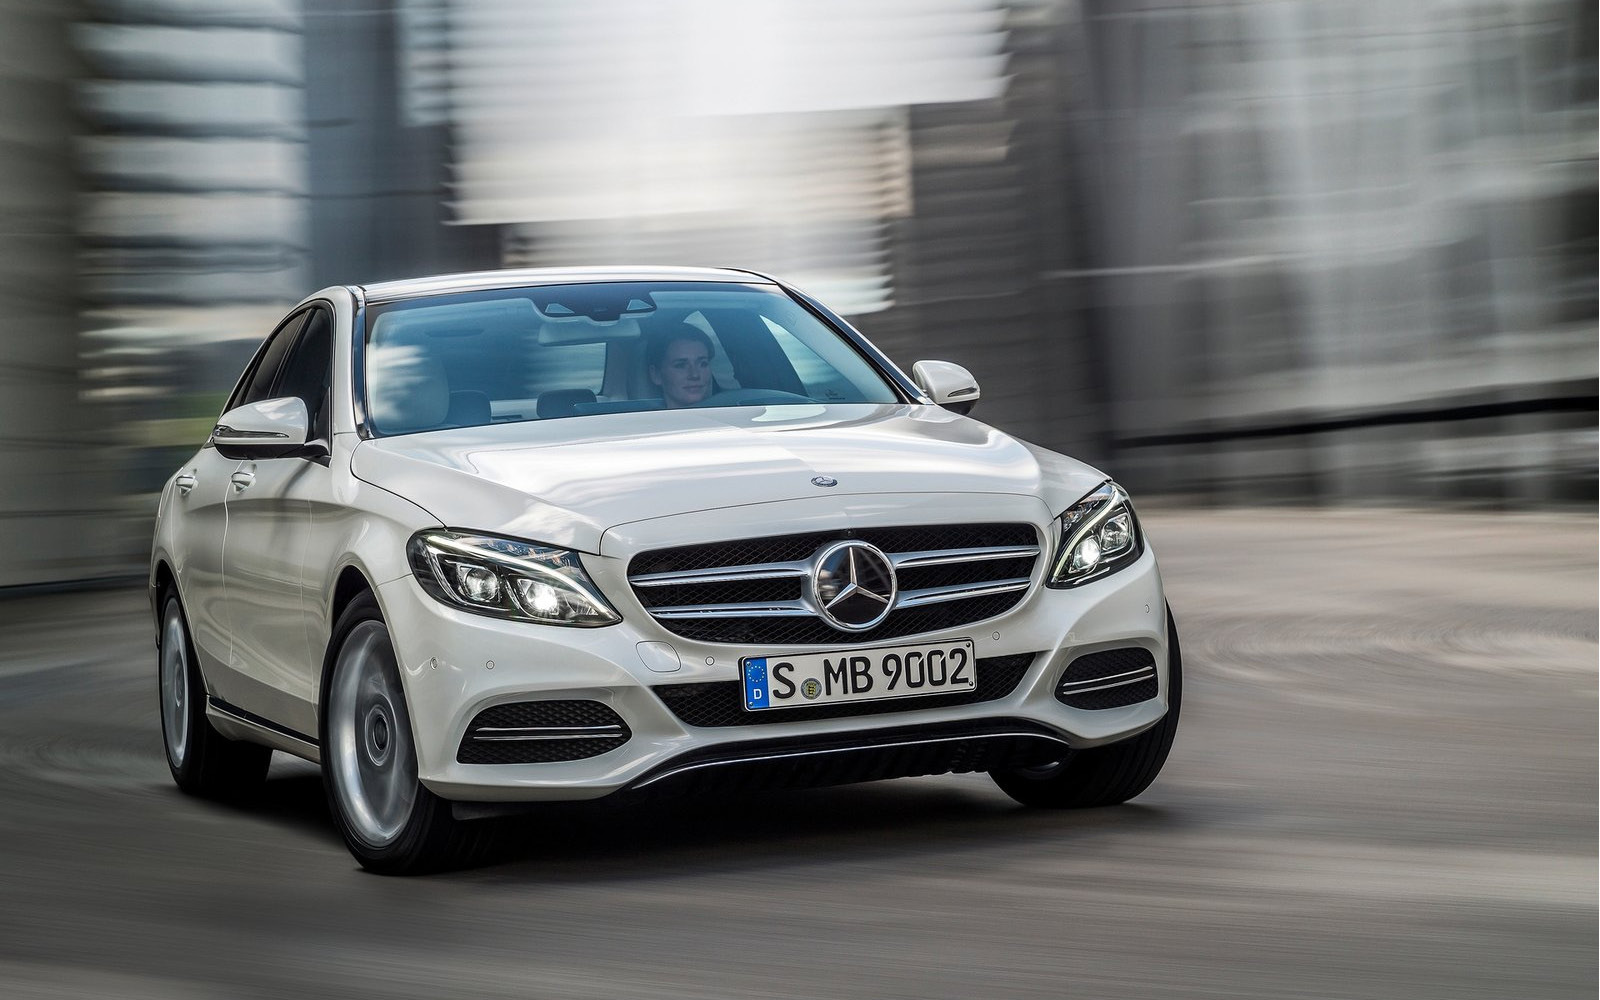 Mercedes benz clase c 2015 43 53 for Mercedes benz clase c